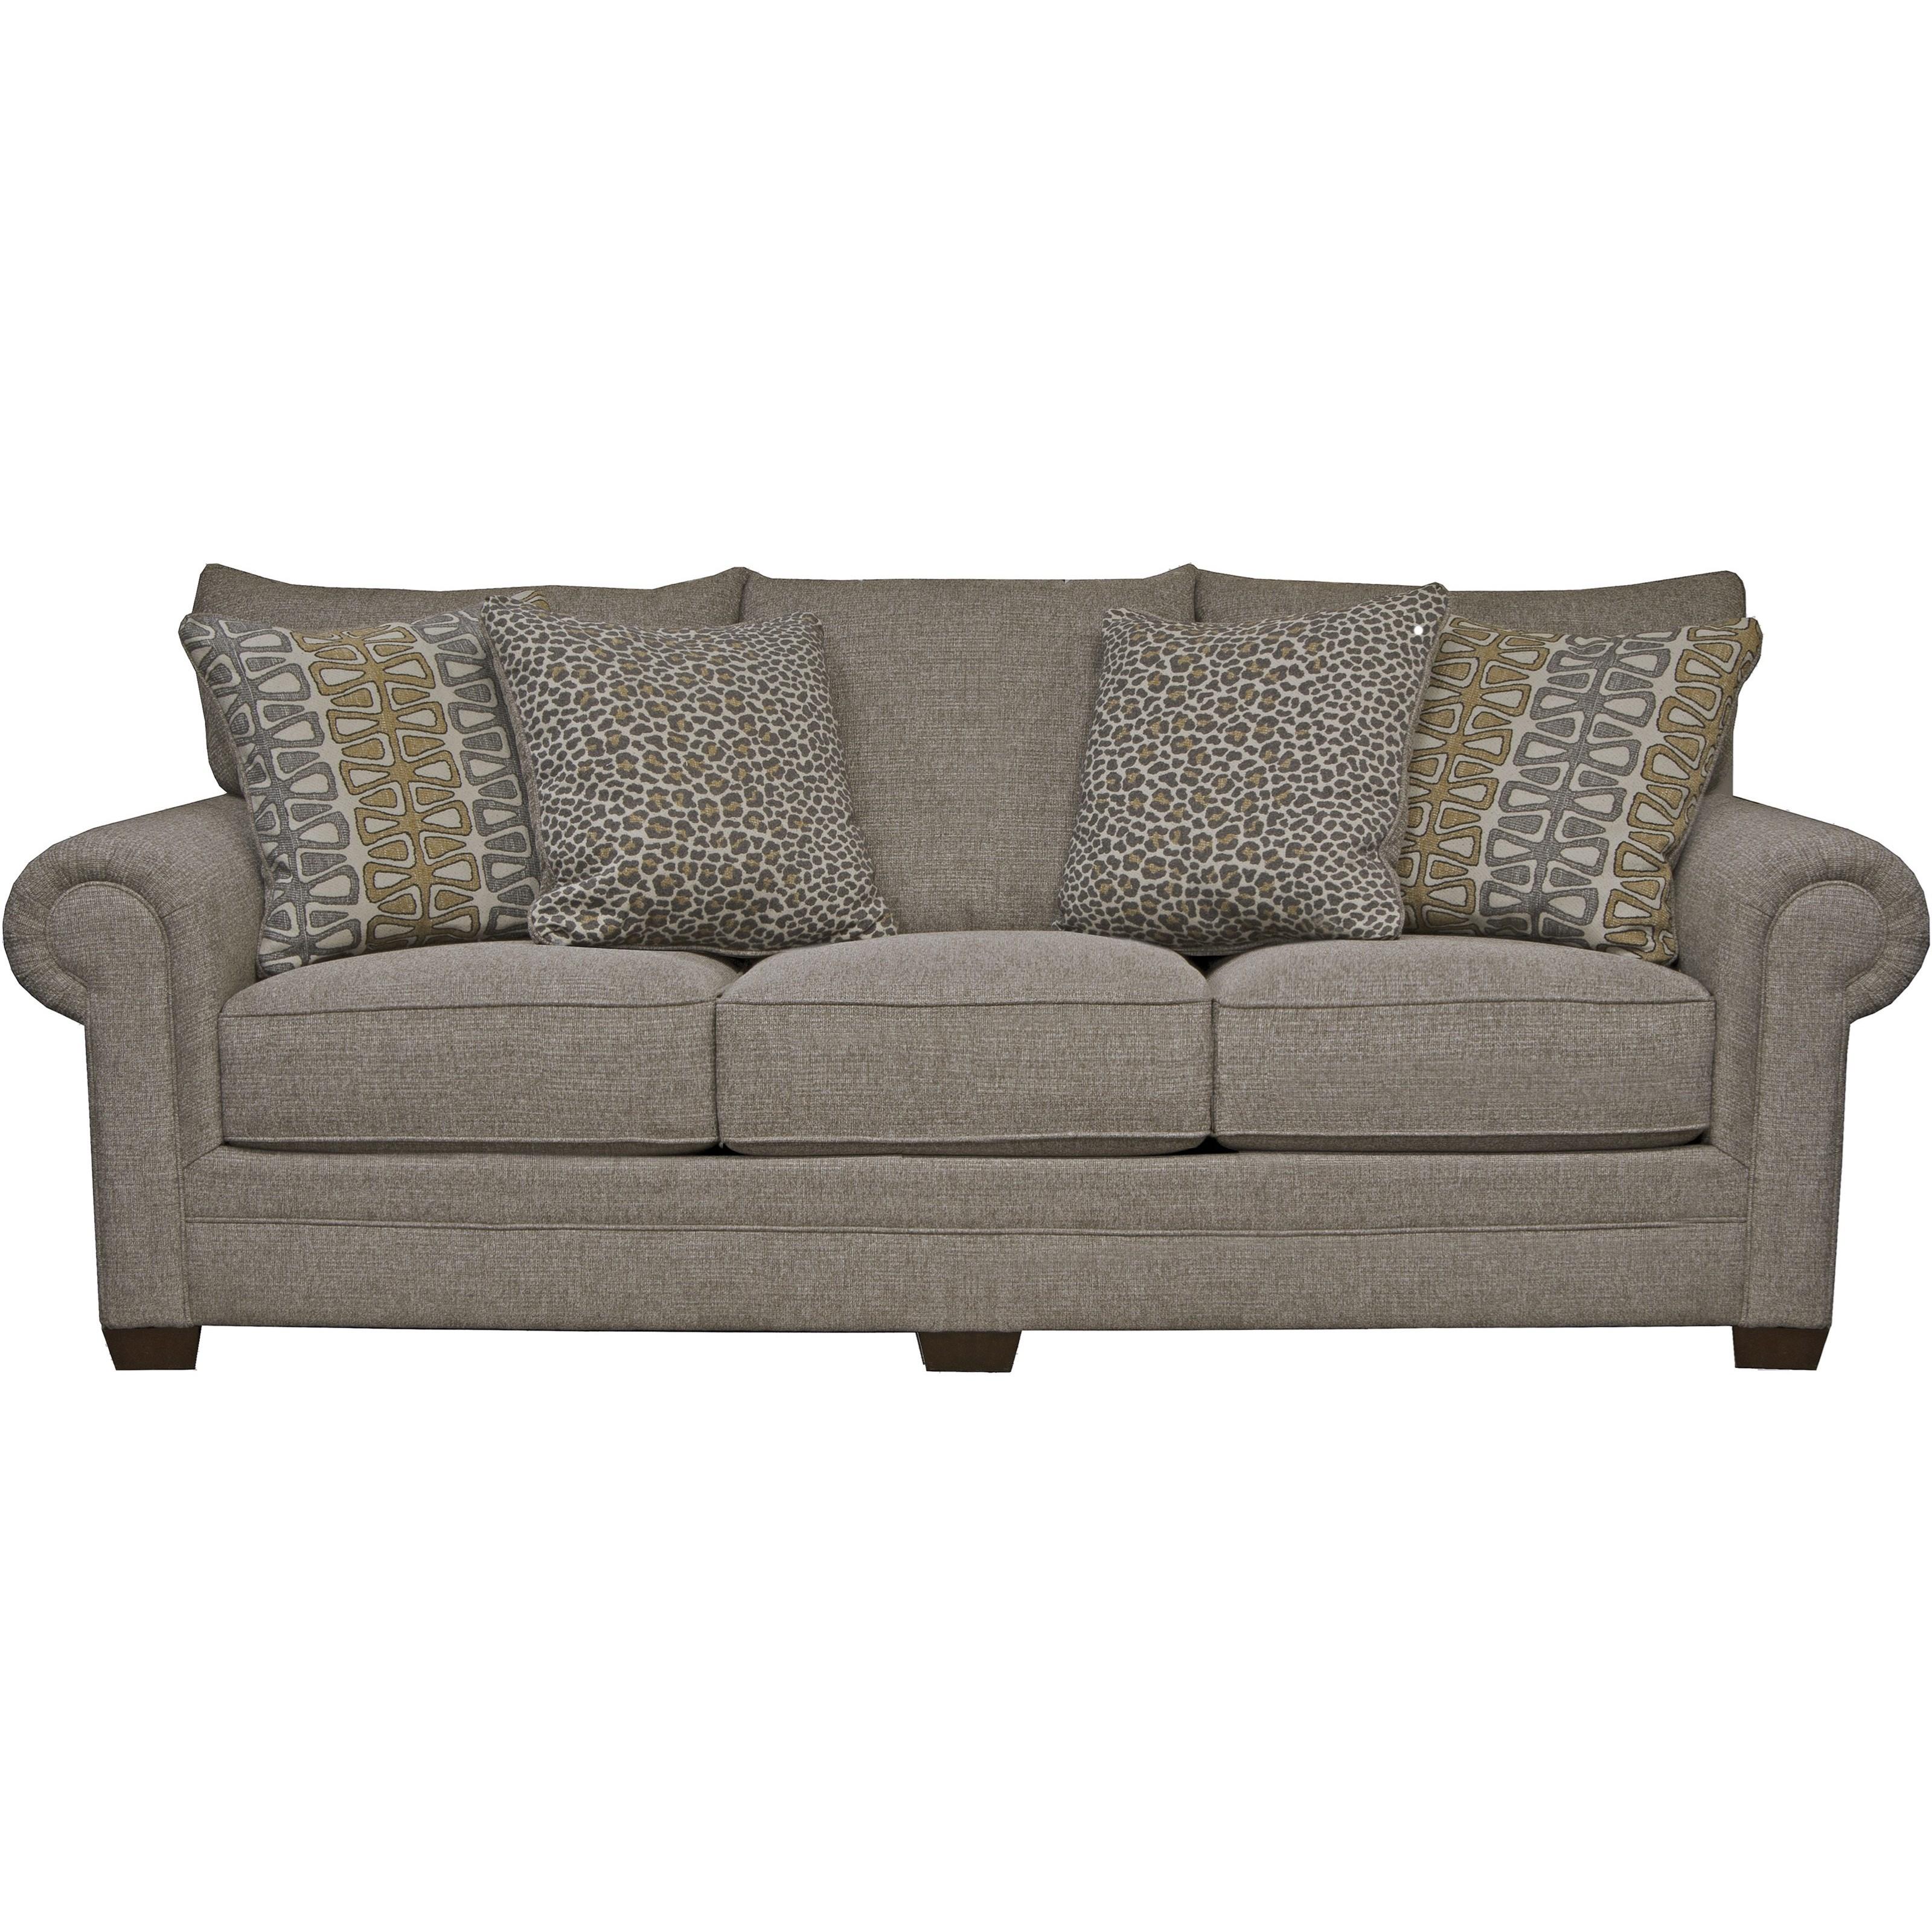 Havana Sofa by Jackson Furniture at Northeast Factory Direct